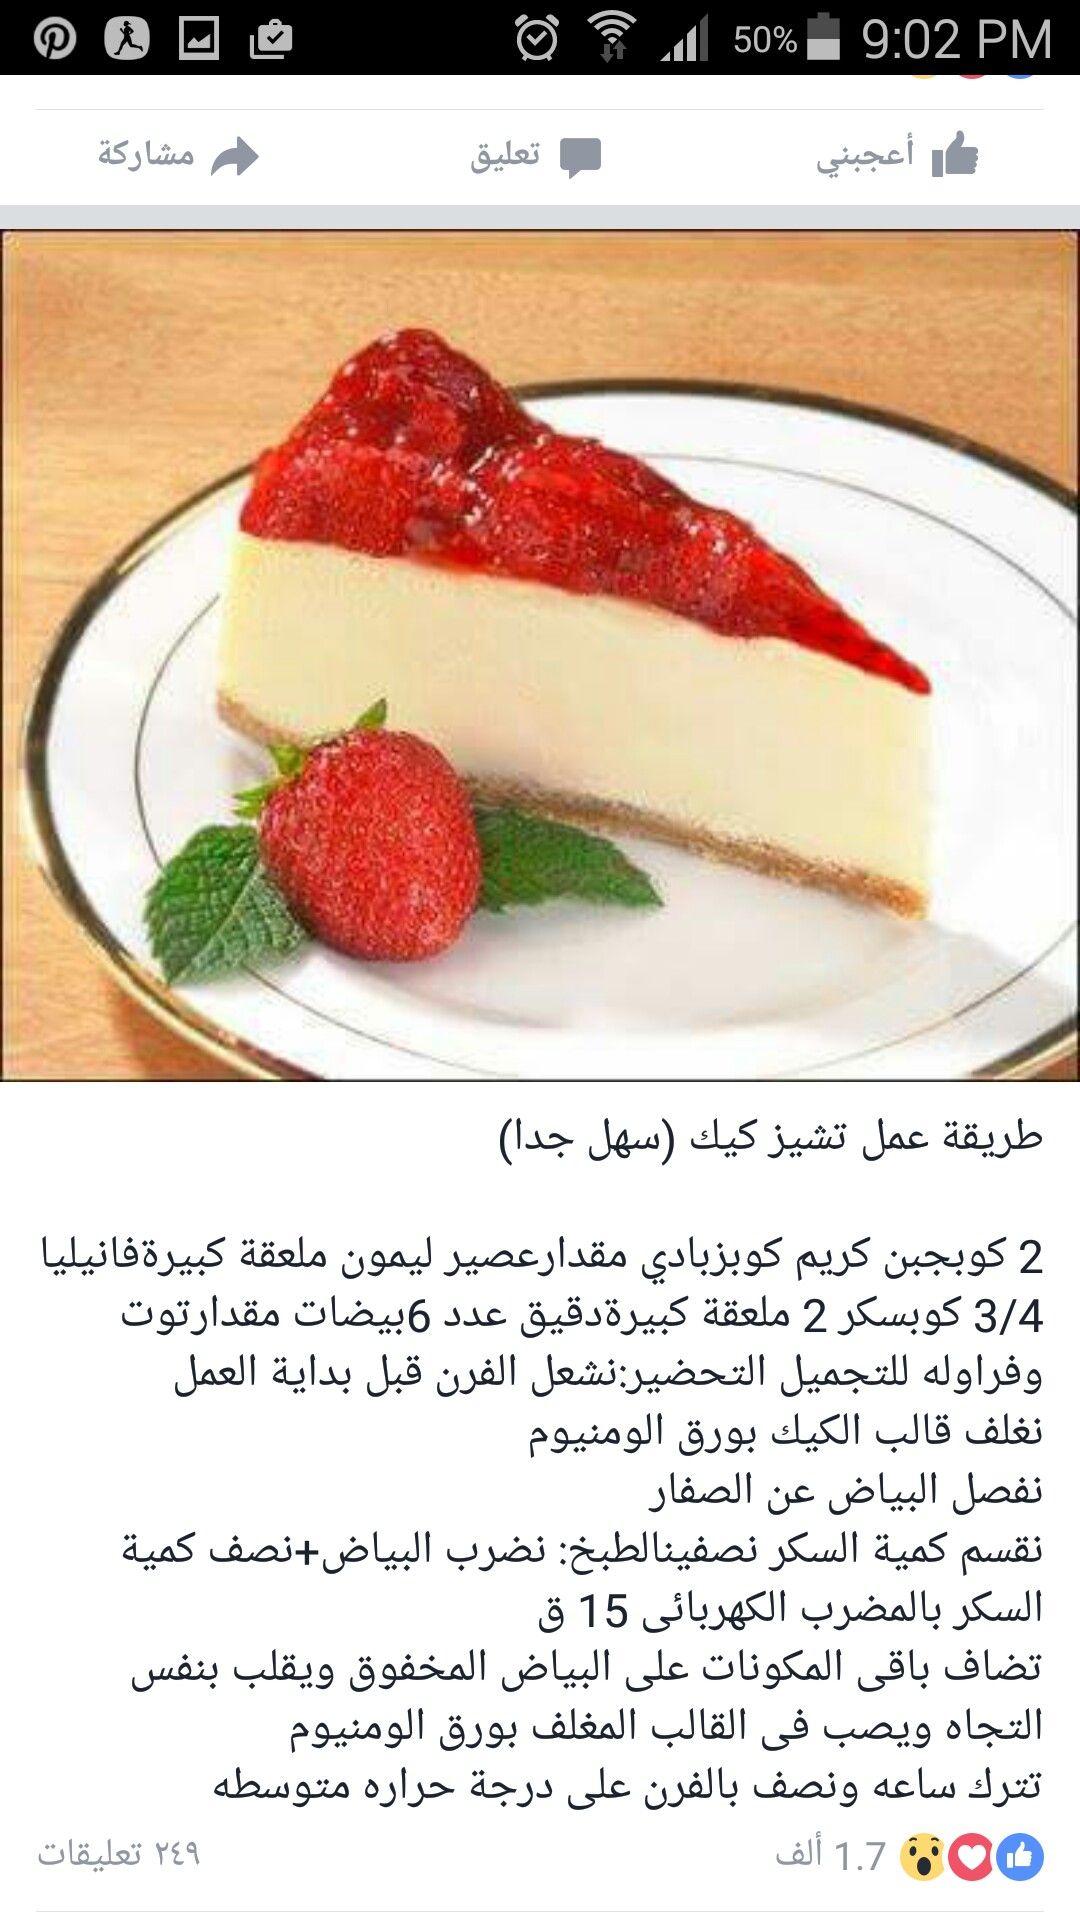 تشيز كيك الفراوله بالفرن Sweets Recipes Mini Cheesecakes Desserts